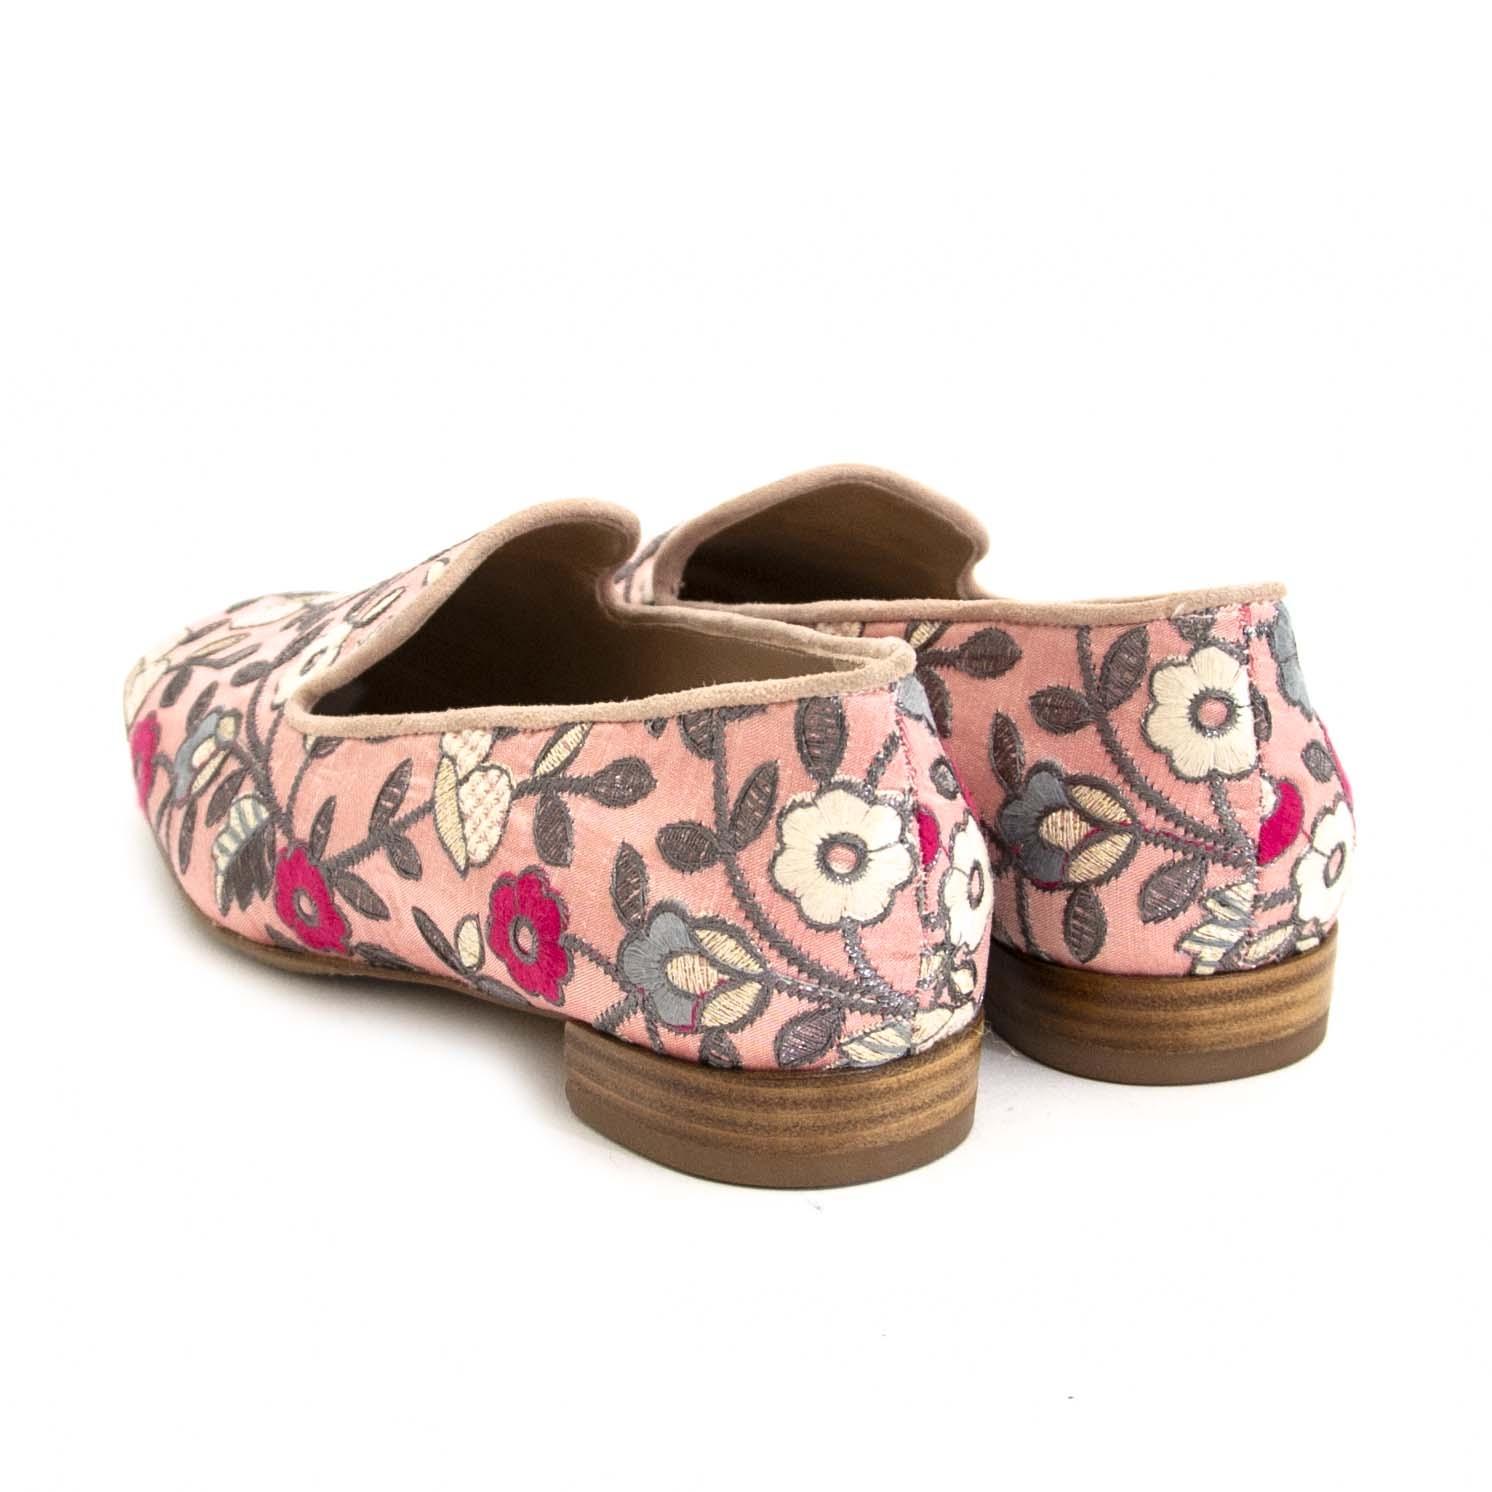 Stuart Weitzman Pink Flower Loafers